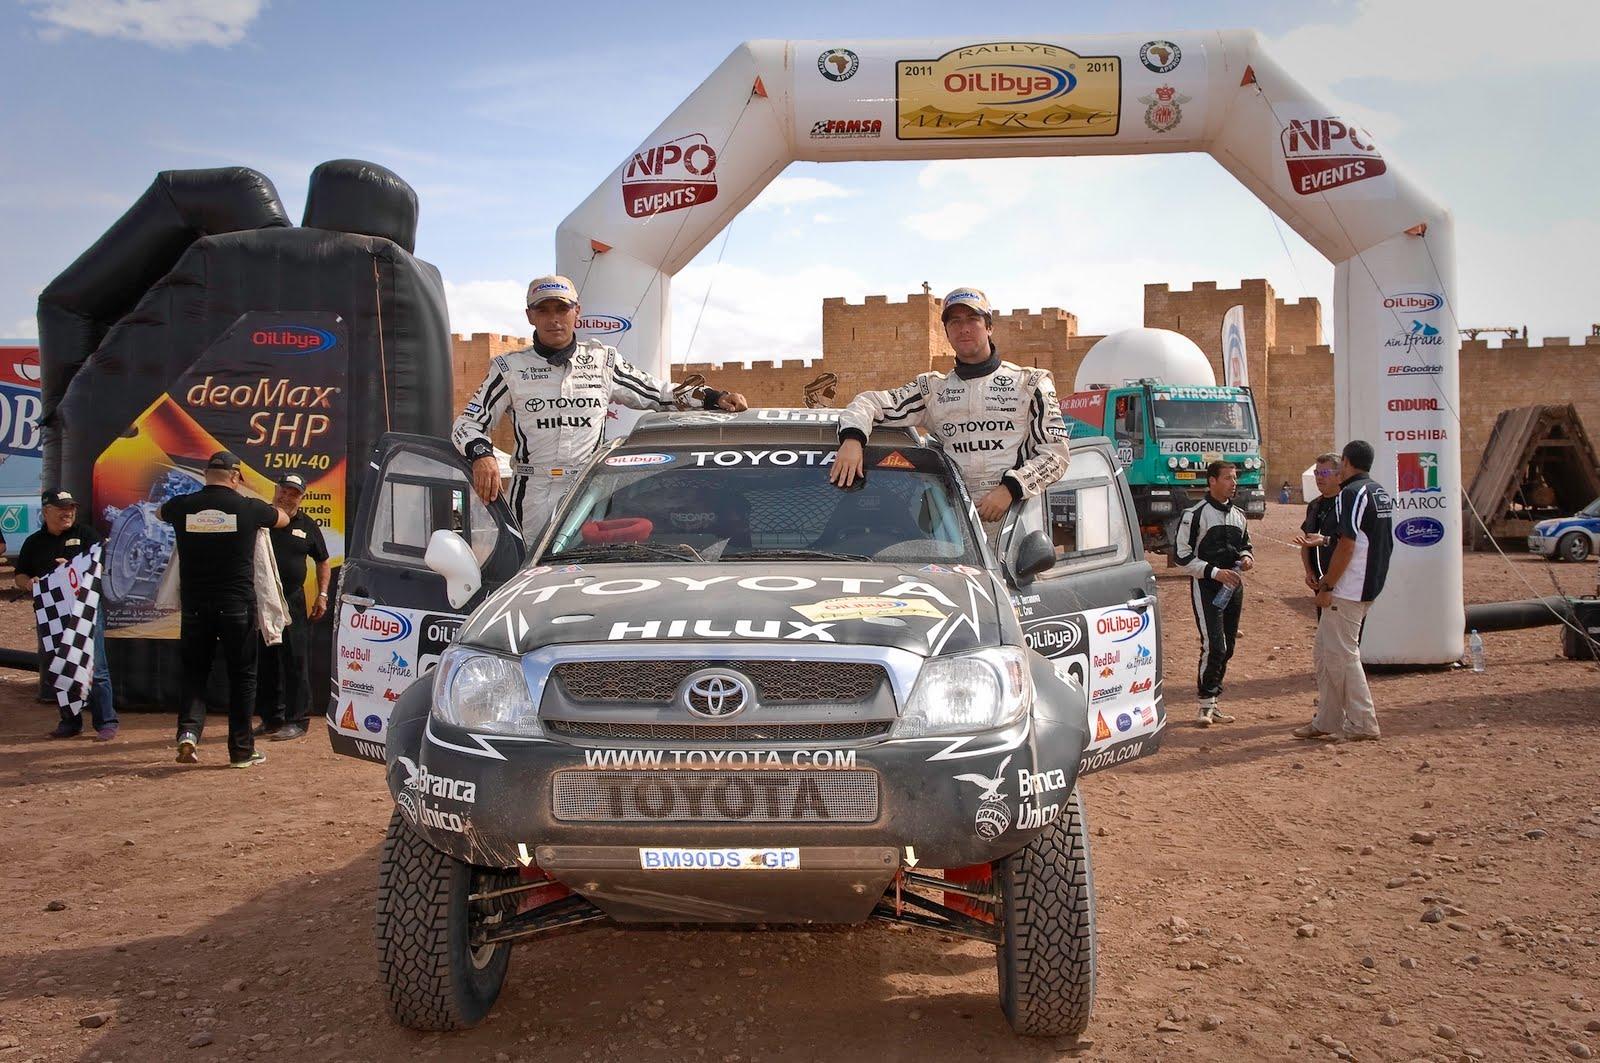 Orly Terranova en Marruecos 2011 donde tuvo destacada labor con la Toyota Hilux de Overdrive.